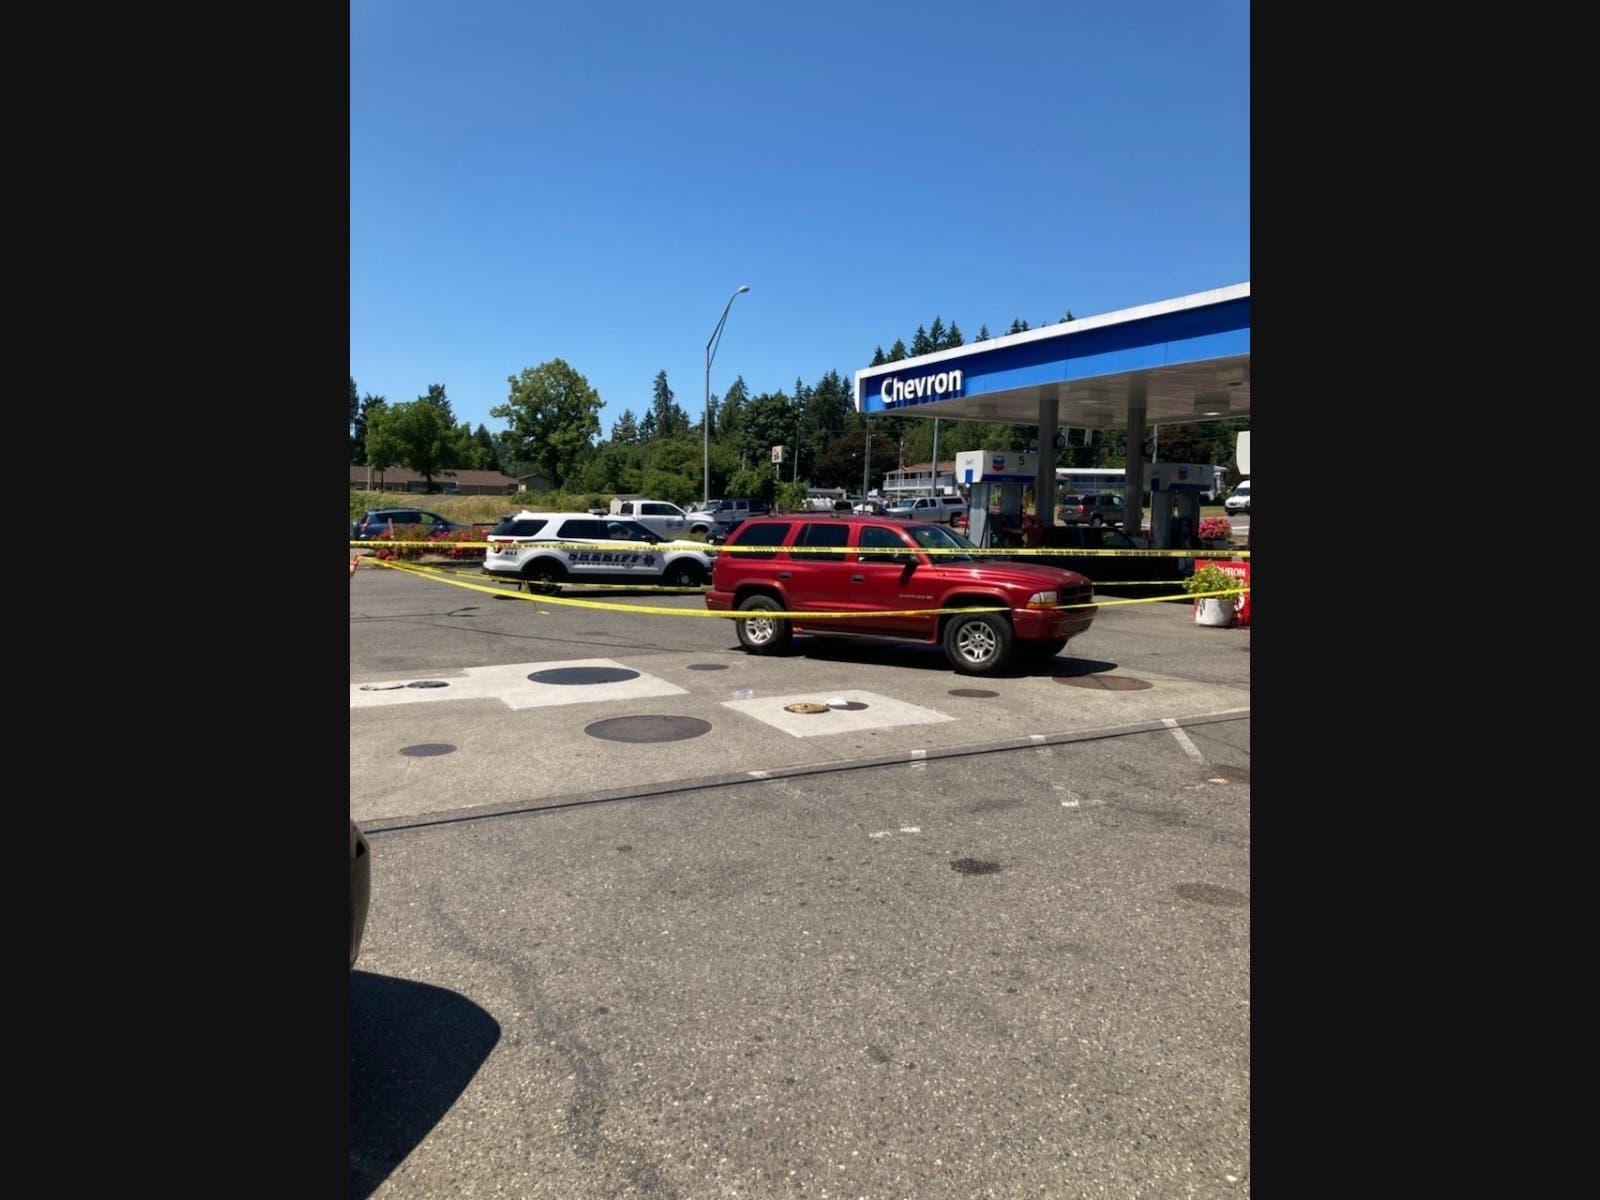 1 Injured In Purdy Shooting, Deputies Investigating